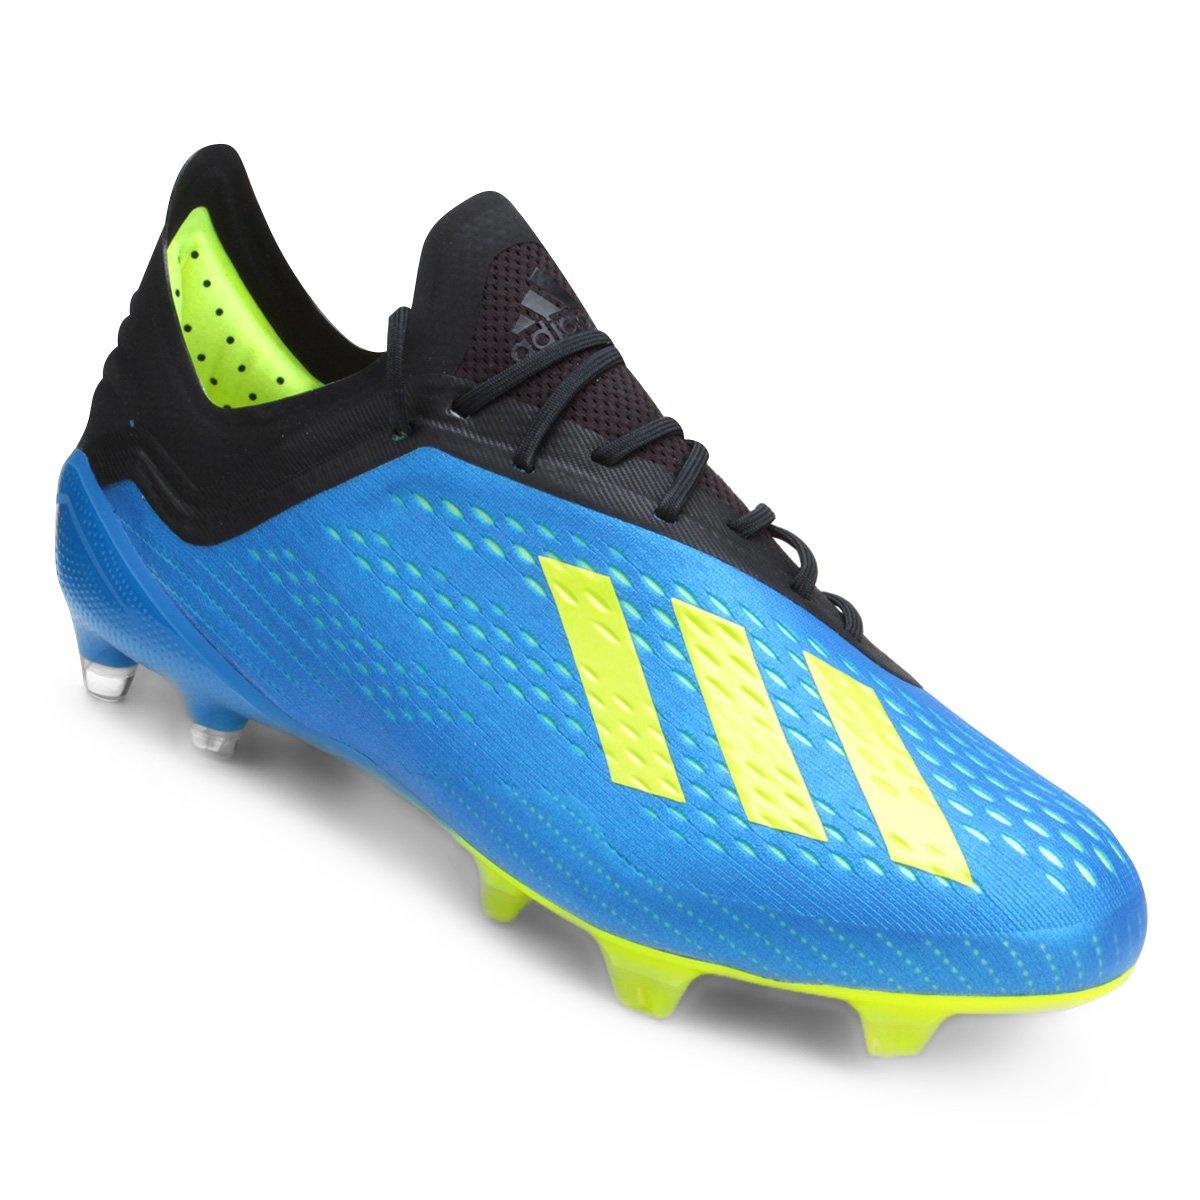 6301ff652b Chuteira Campo Adidas X 18 1 FG